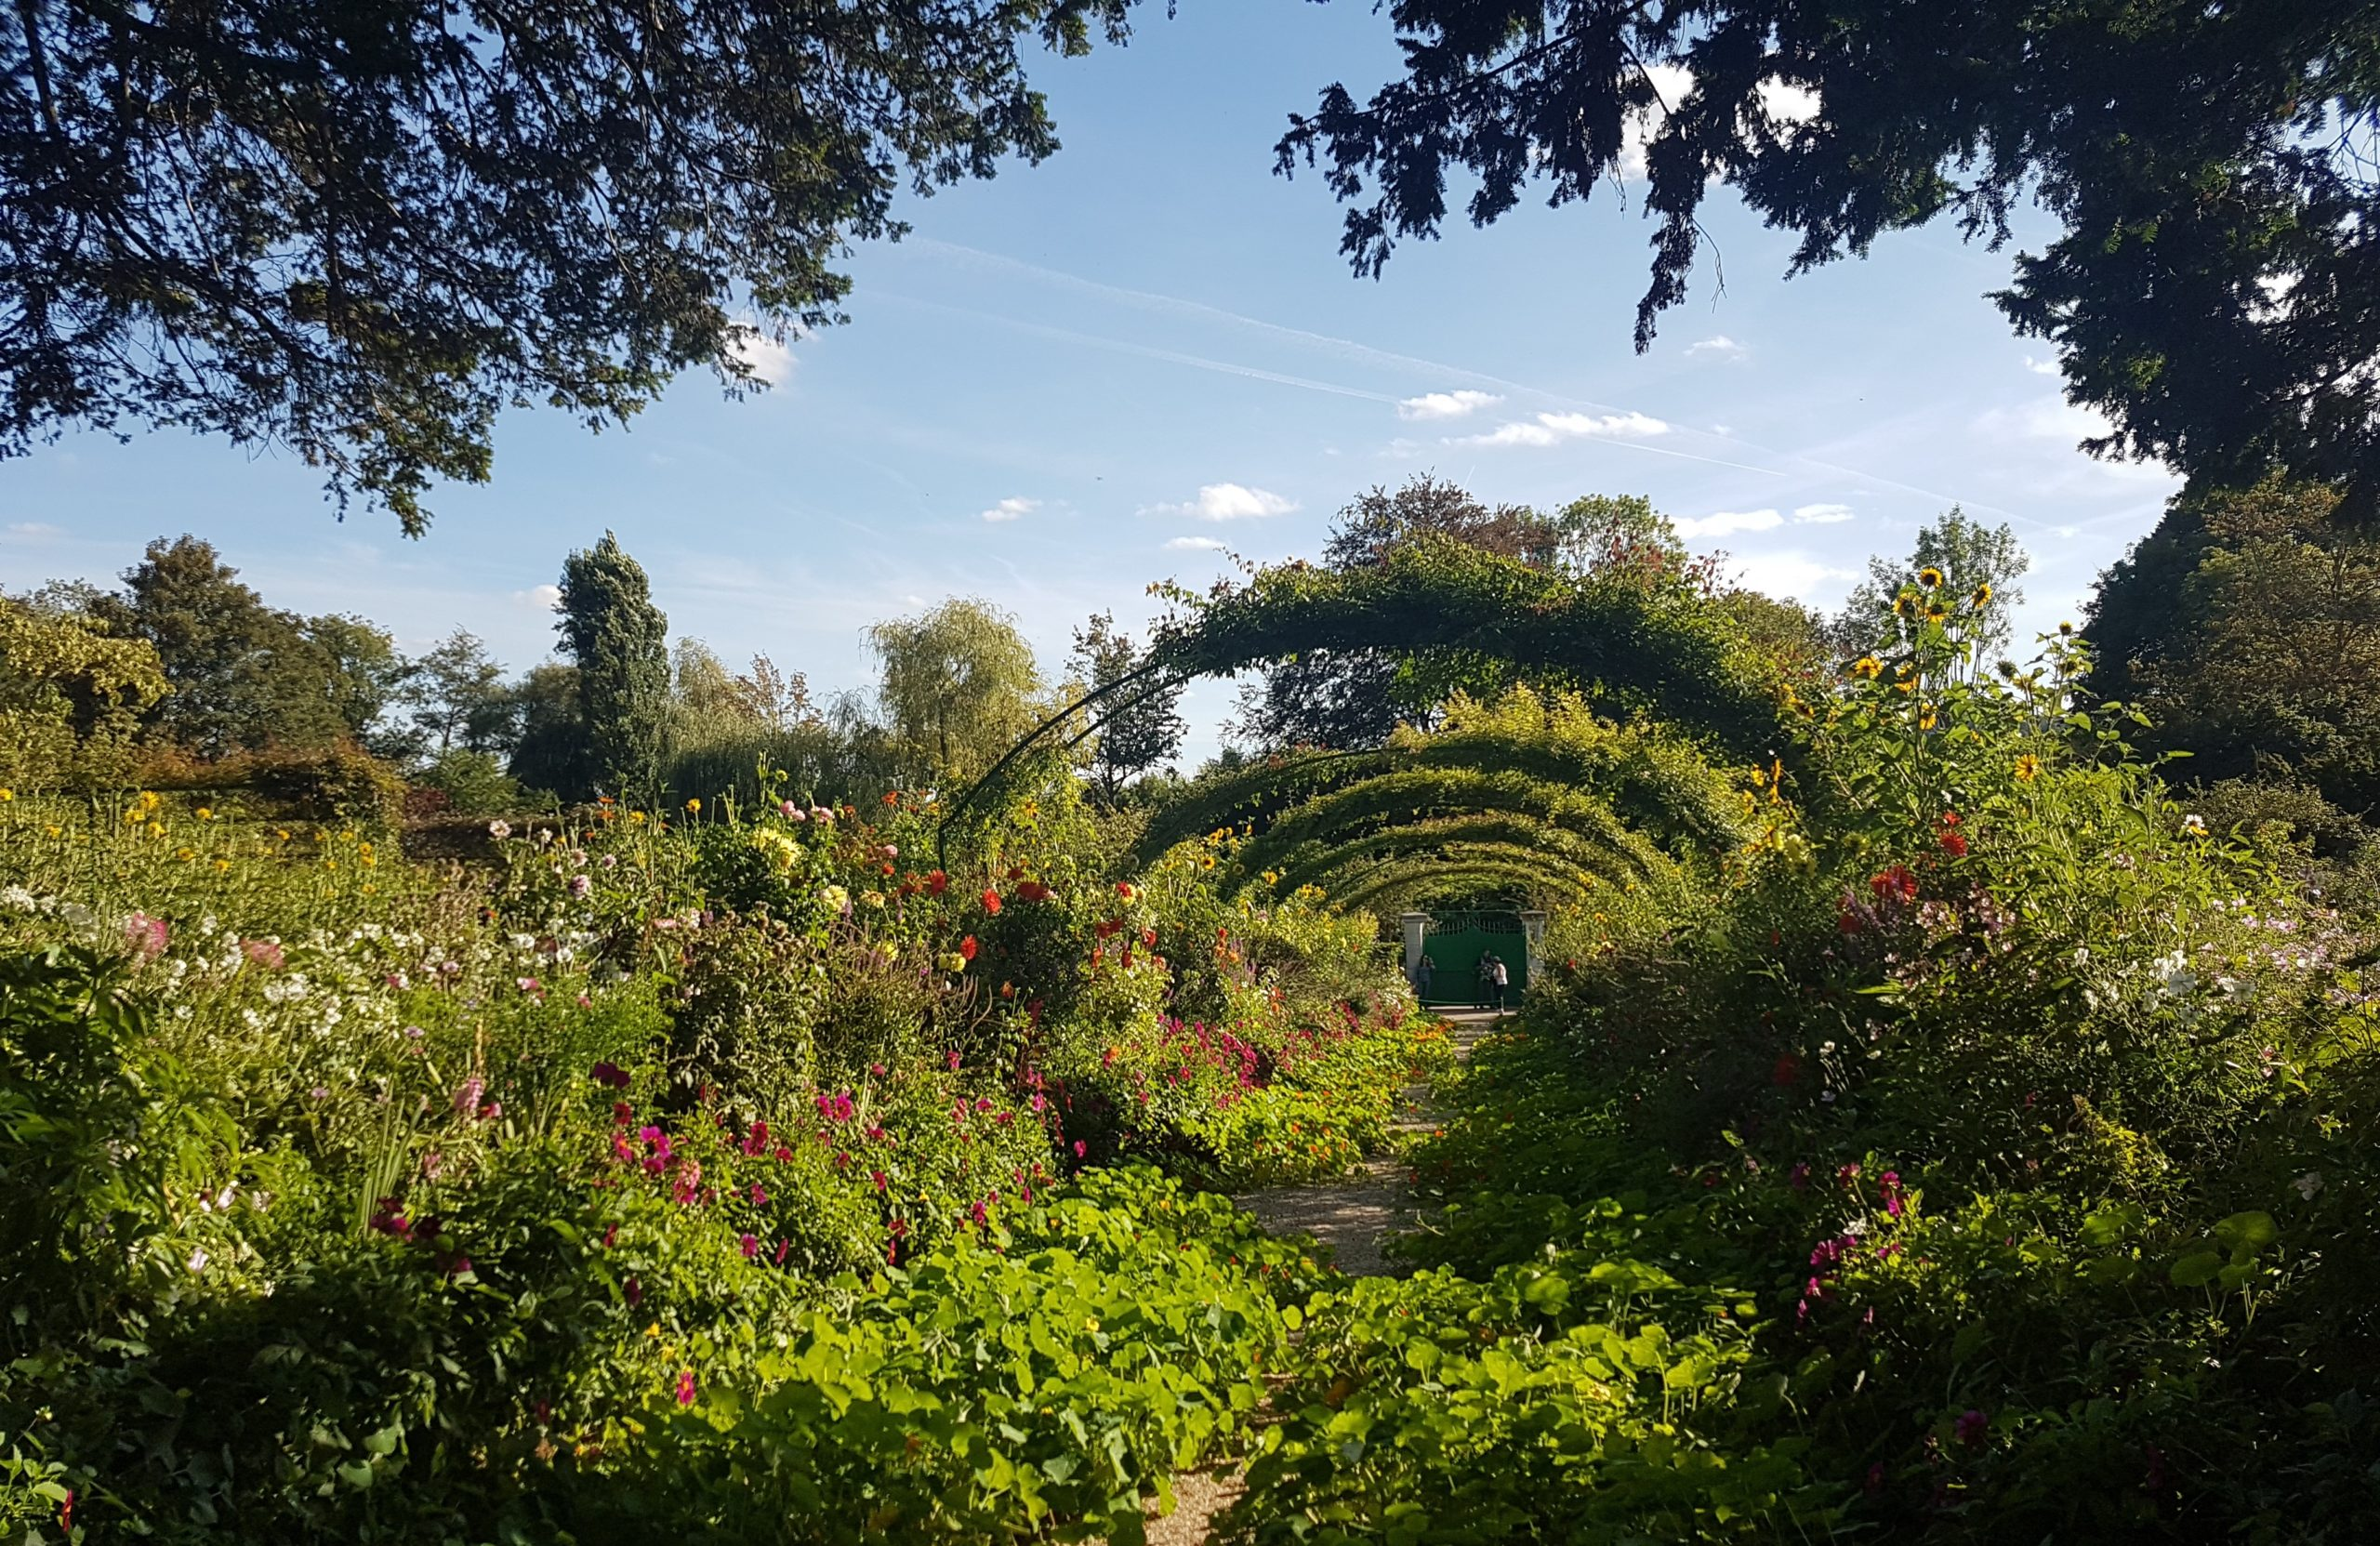 Garden-Monet-Giverny-Impressionism